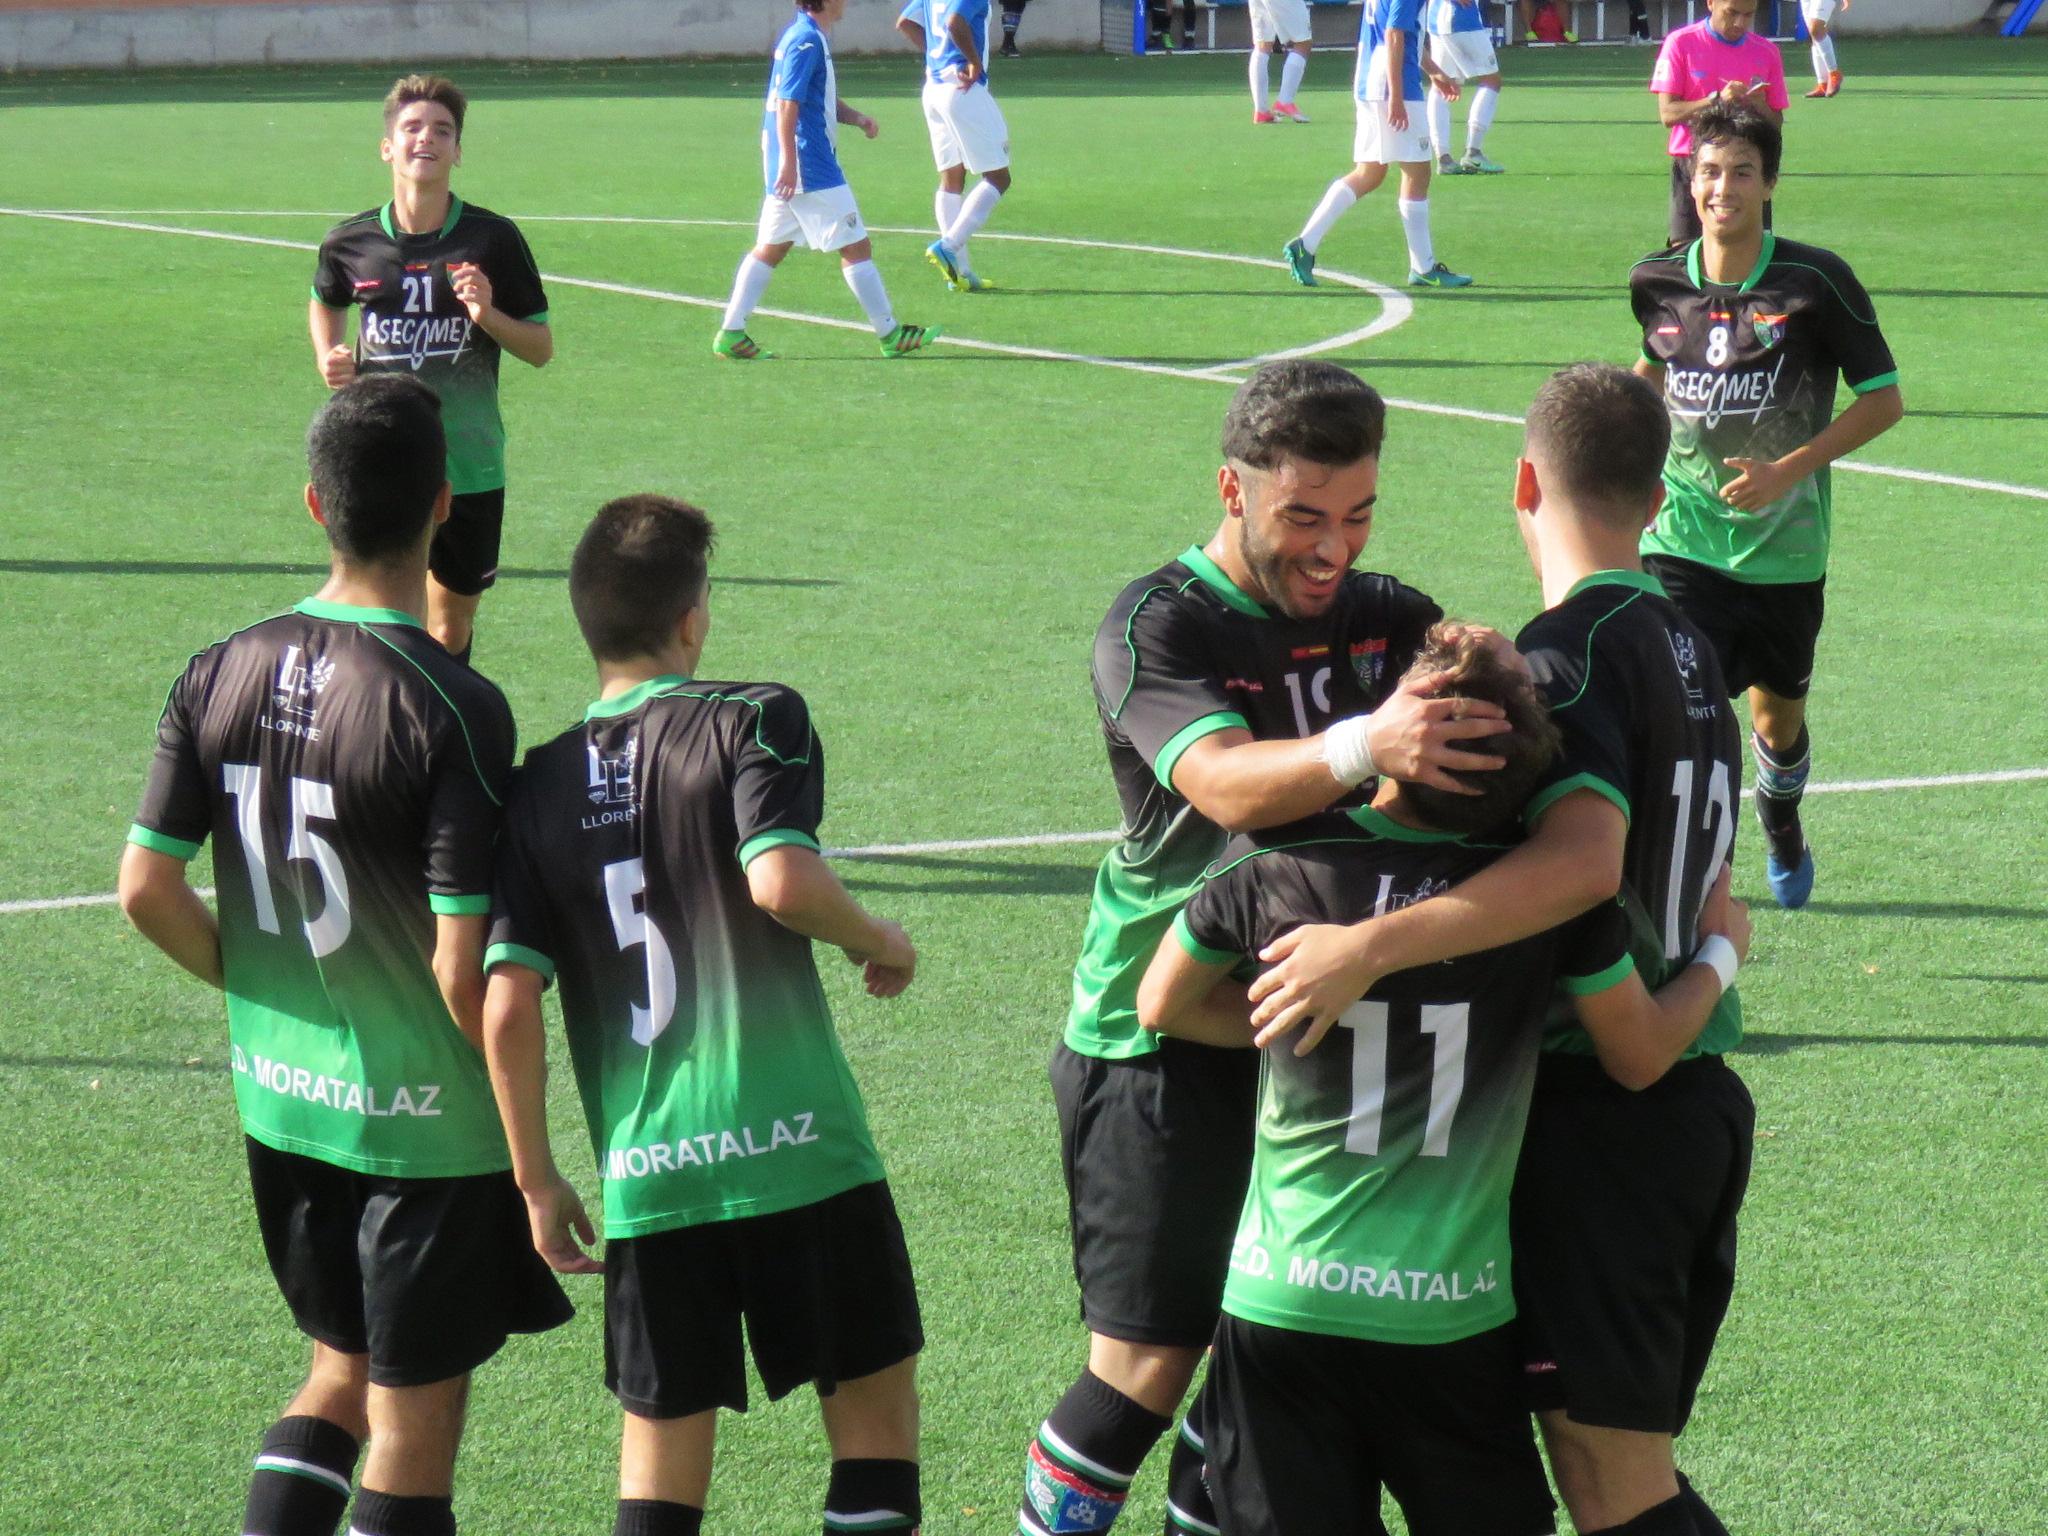 Crónica y fotos del partido CD Leganés C 2-6 Juvenil B